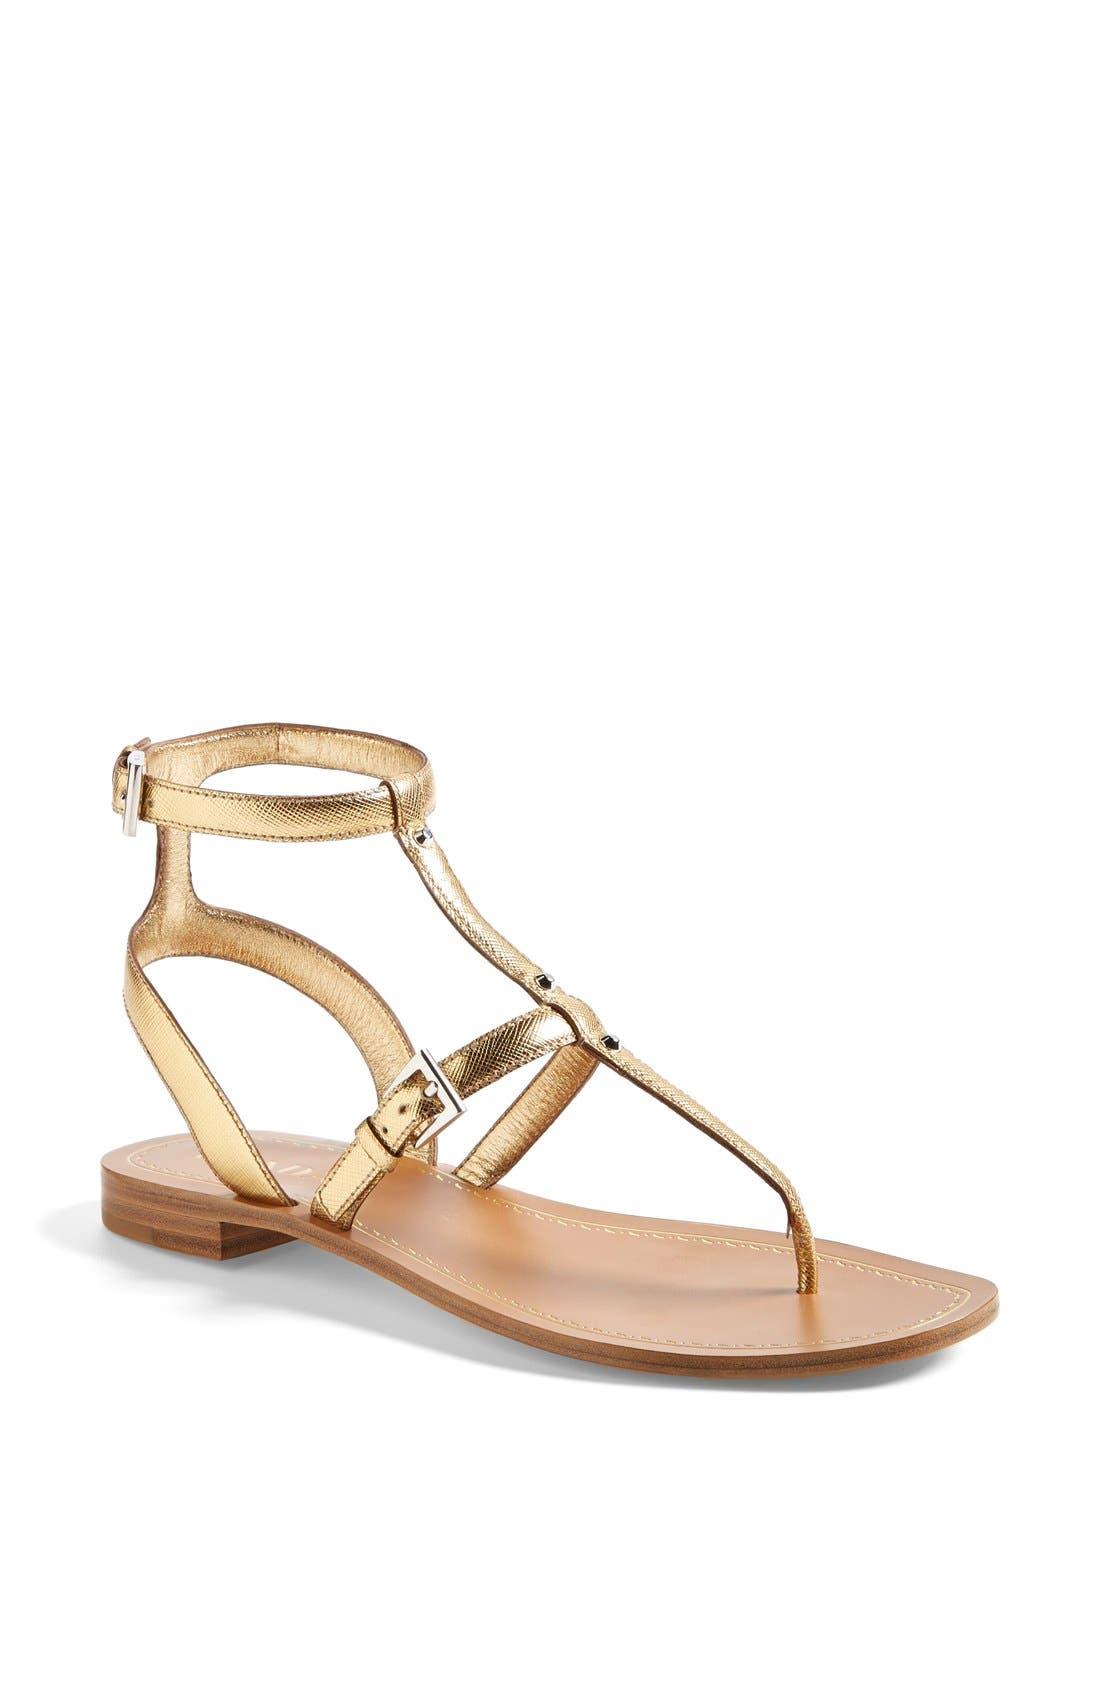 Alternate Image 1 Selected - Prada Gladiator Sandal